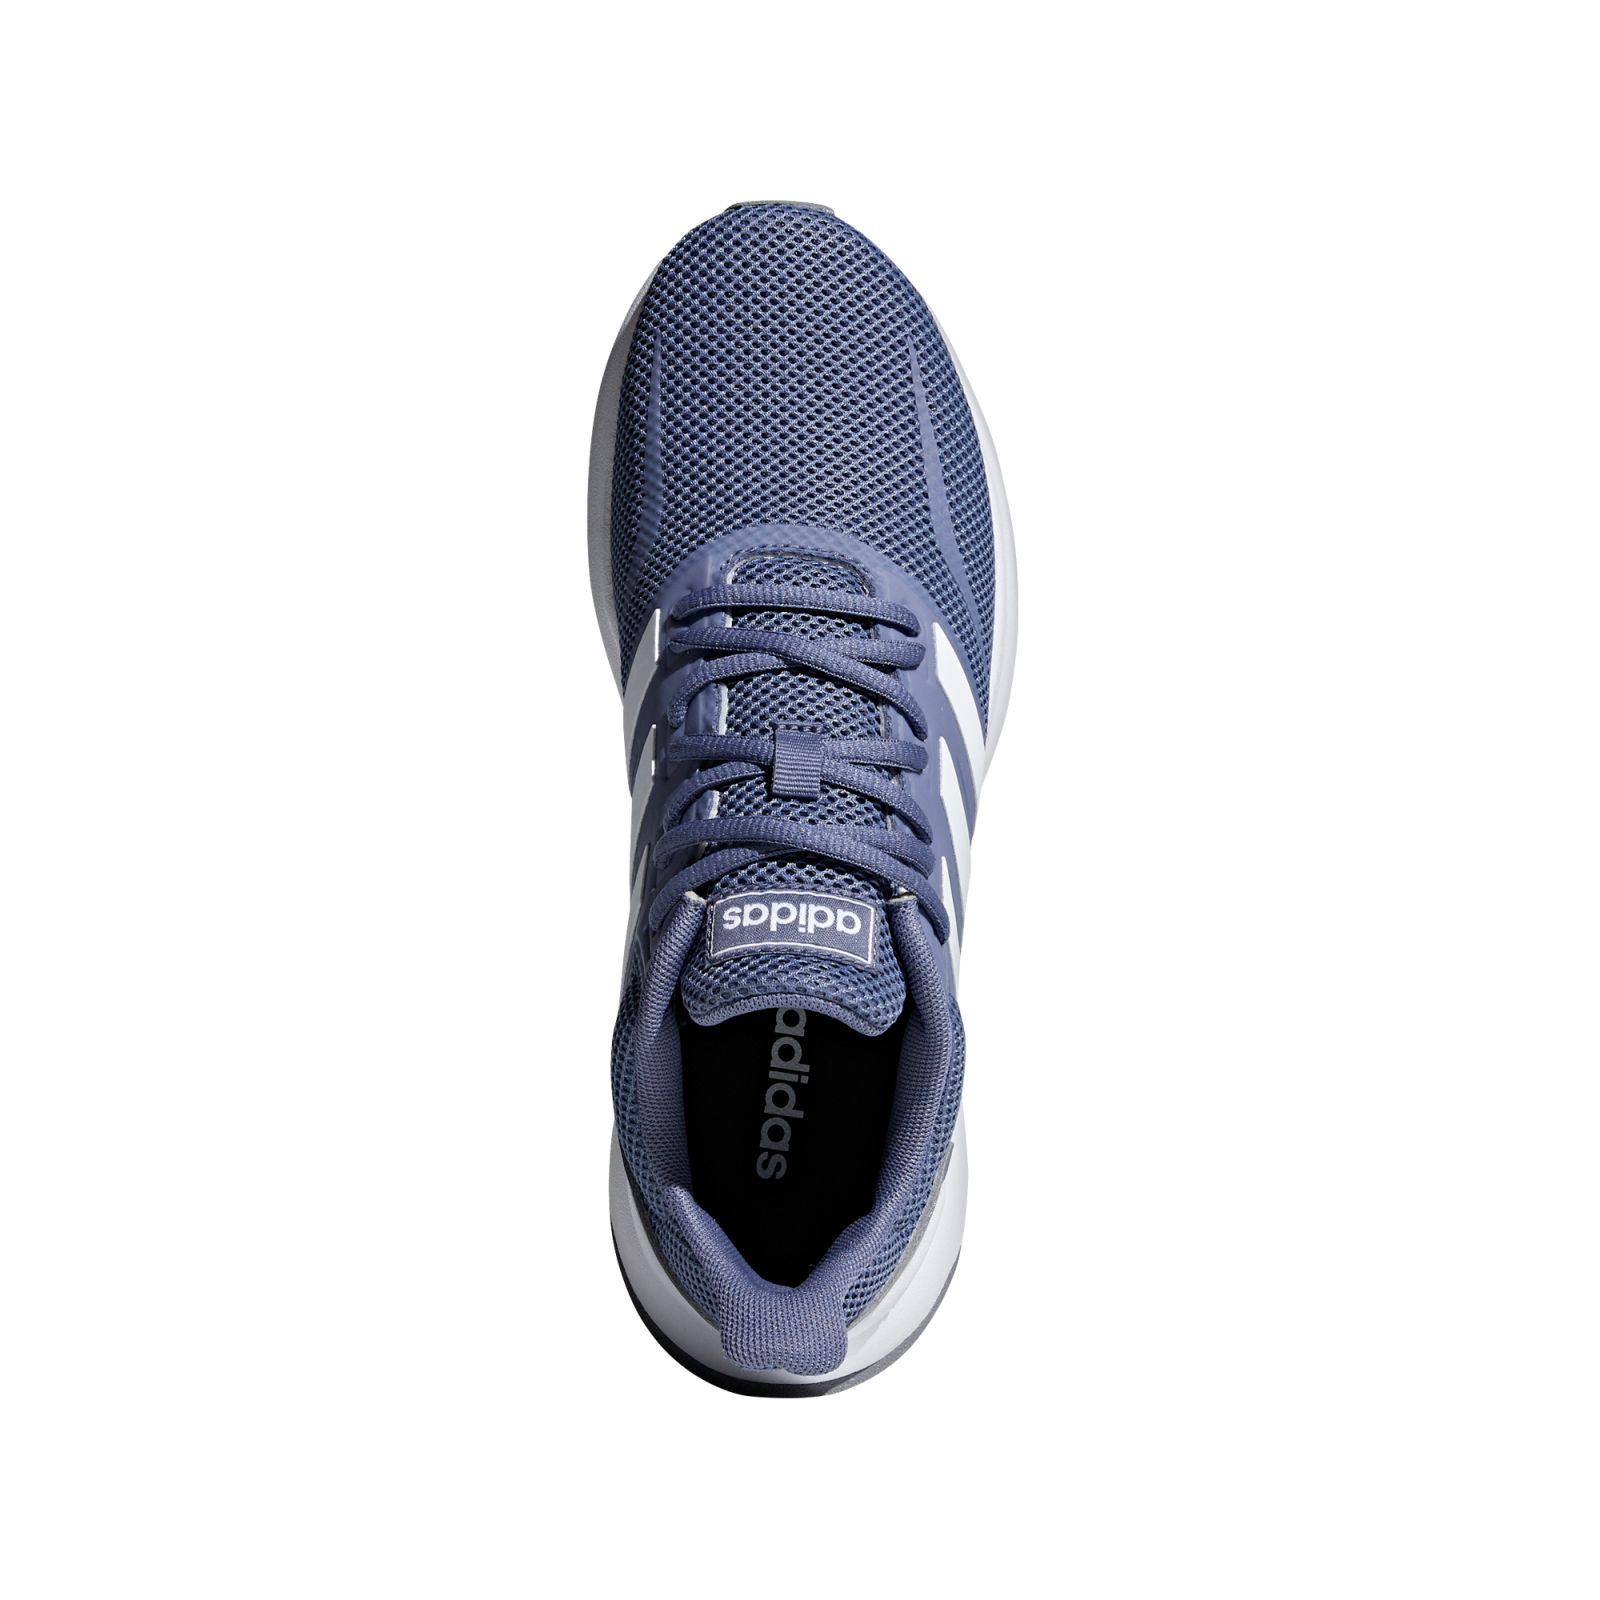 Adidas Freizeit Performance Fitness Indigo Runfalcon Lauf Schuhe Détails Femmes Sur dsrQxhtC